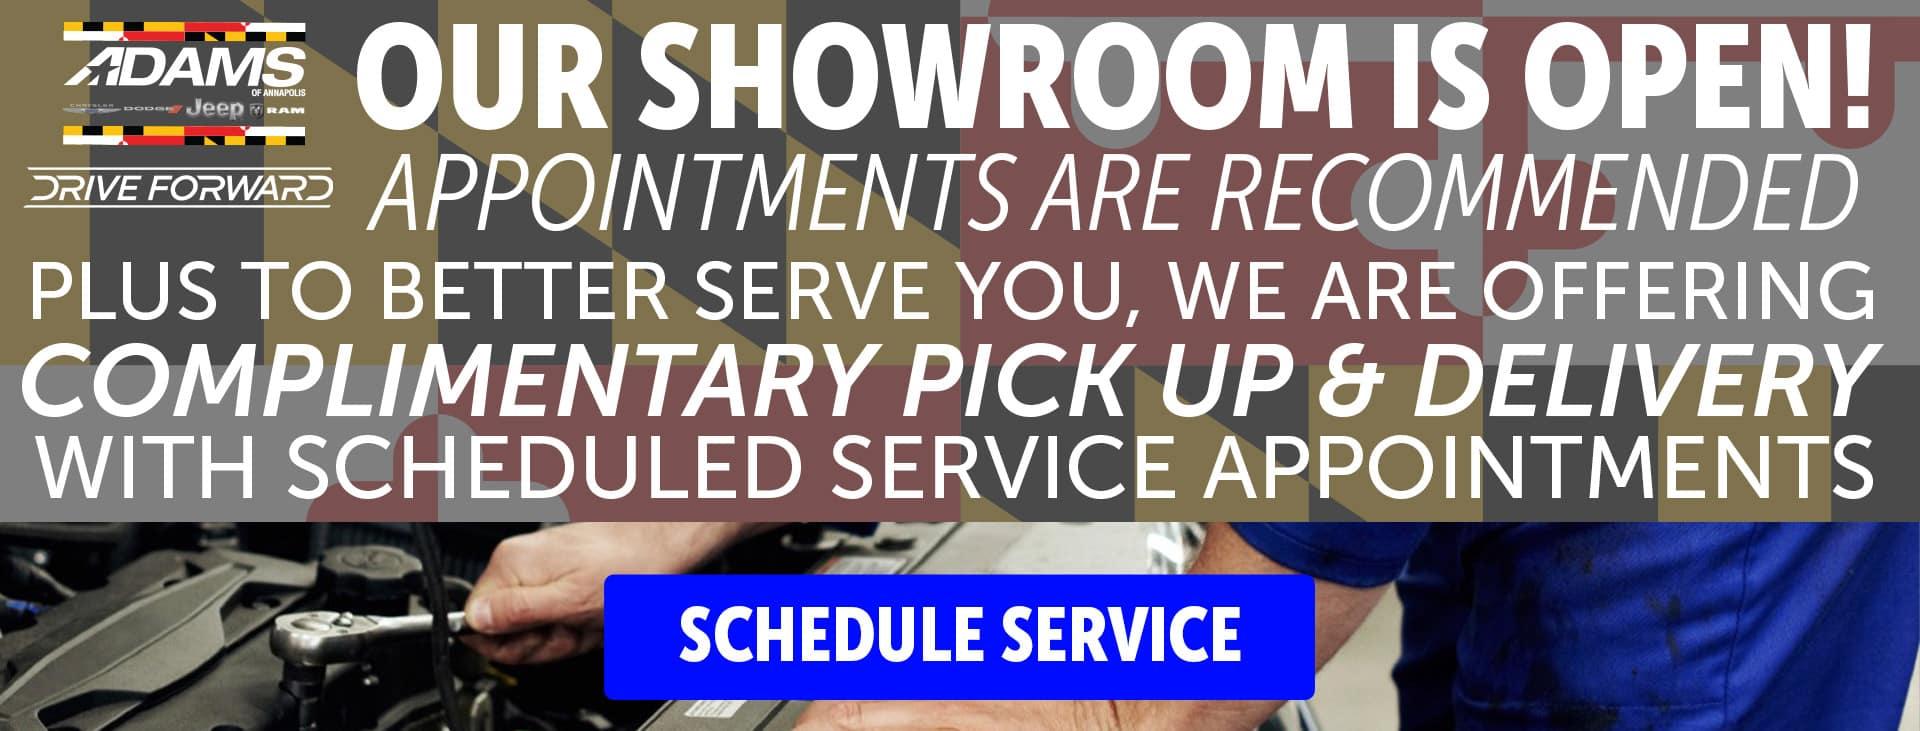 Schedule Your Service Online